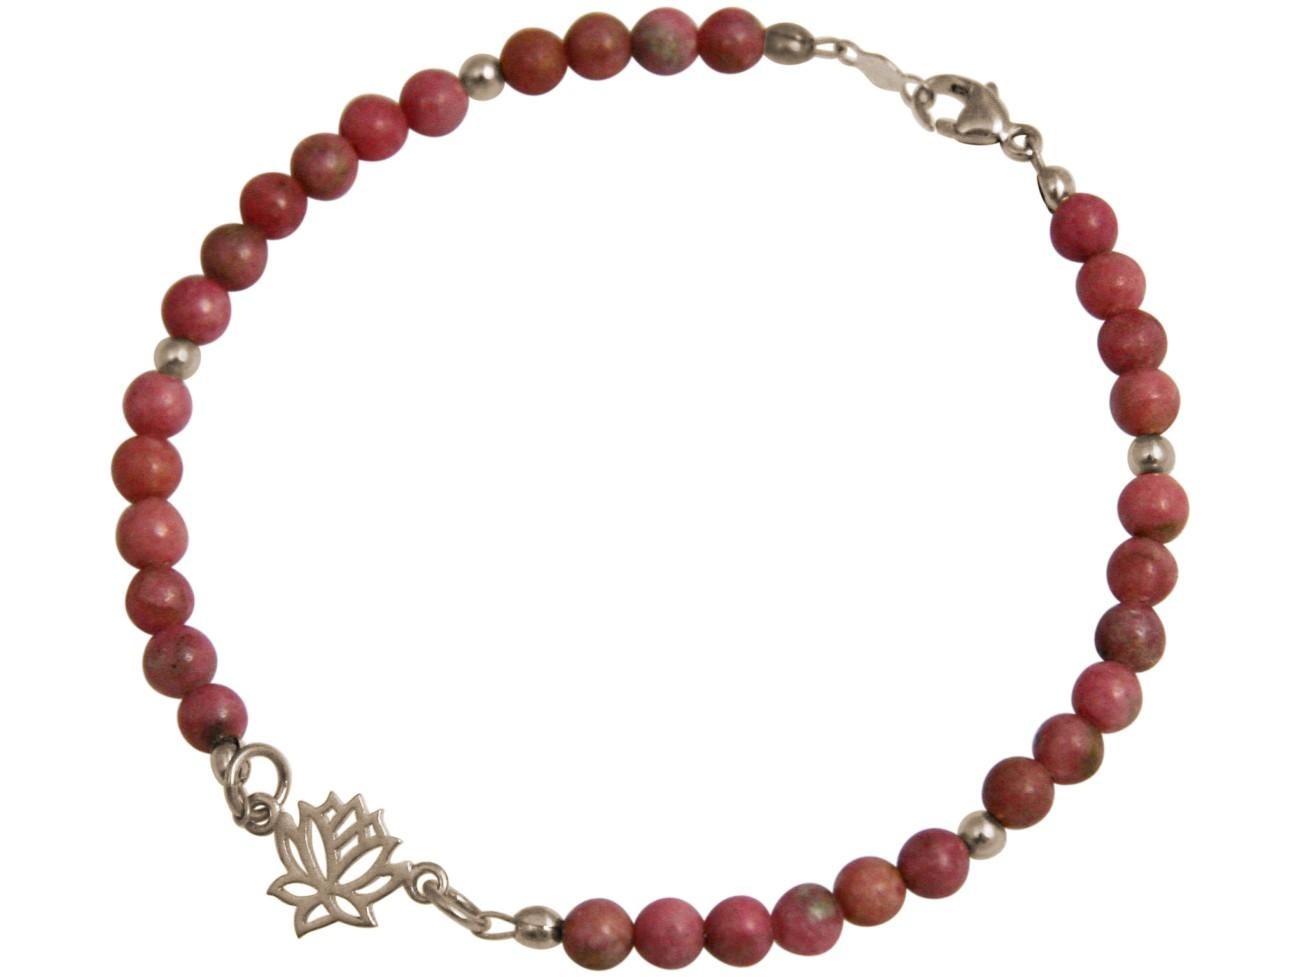 Armband 925 Silber Lotus Blume EdelsteinRosa YOGA